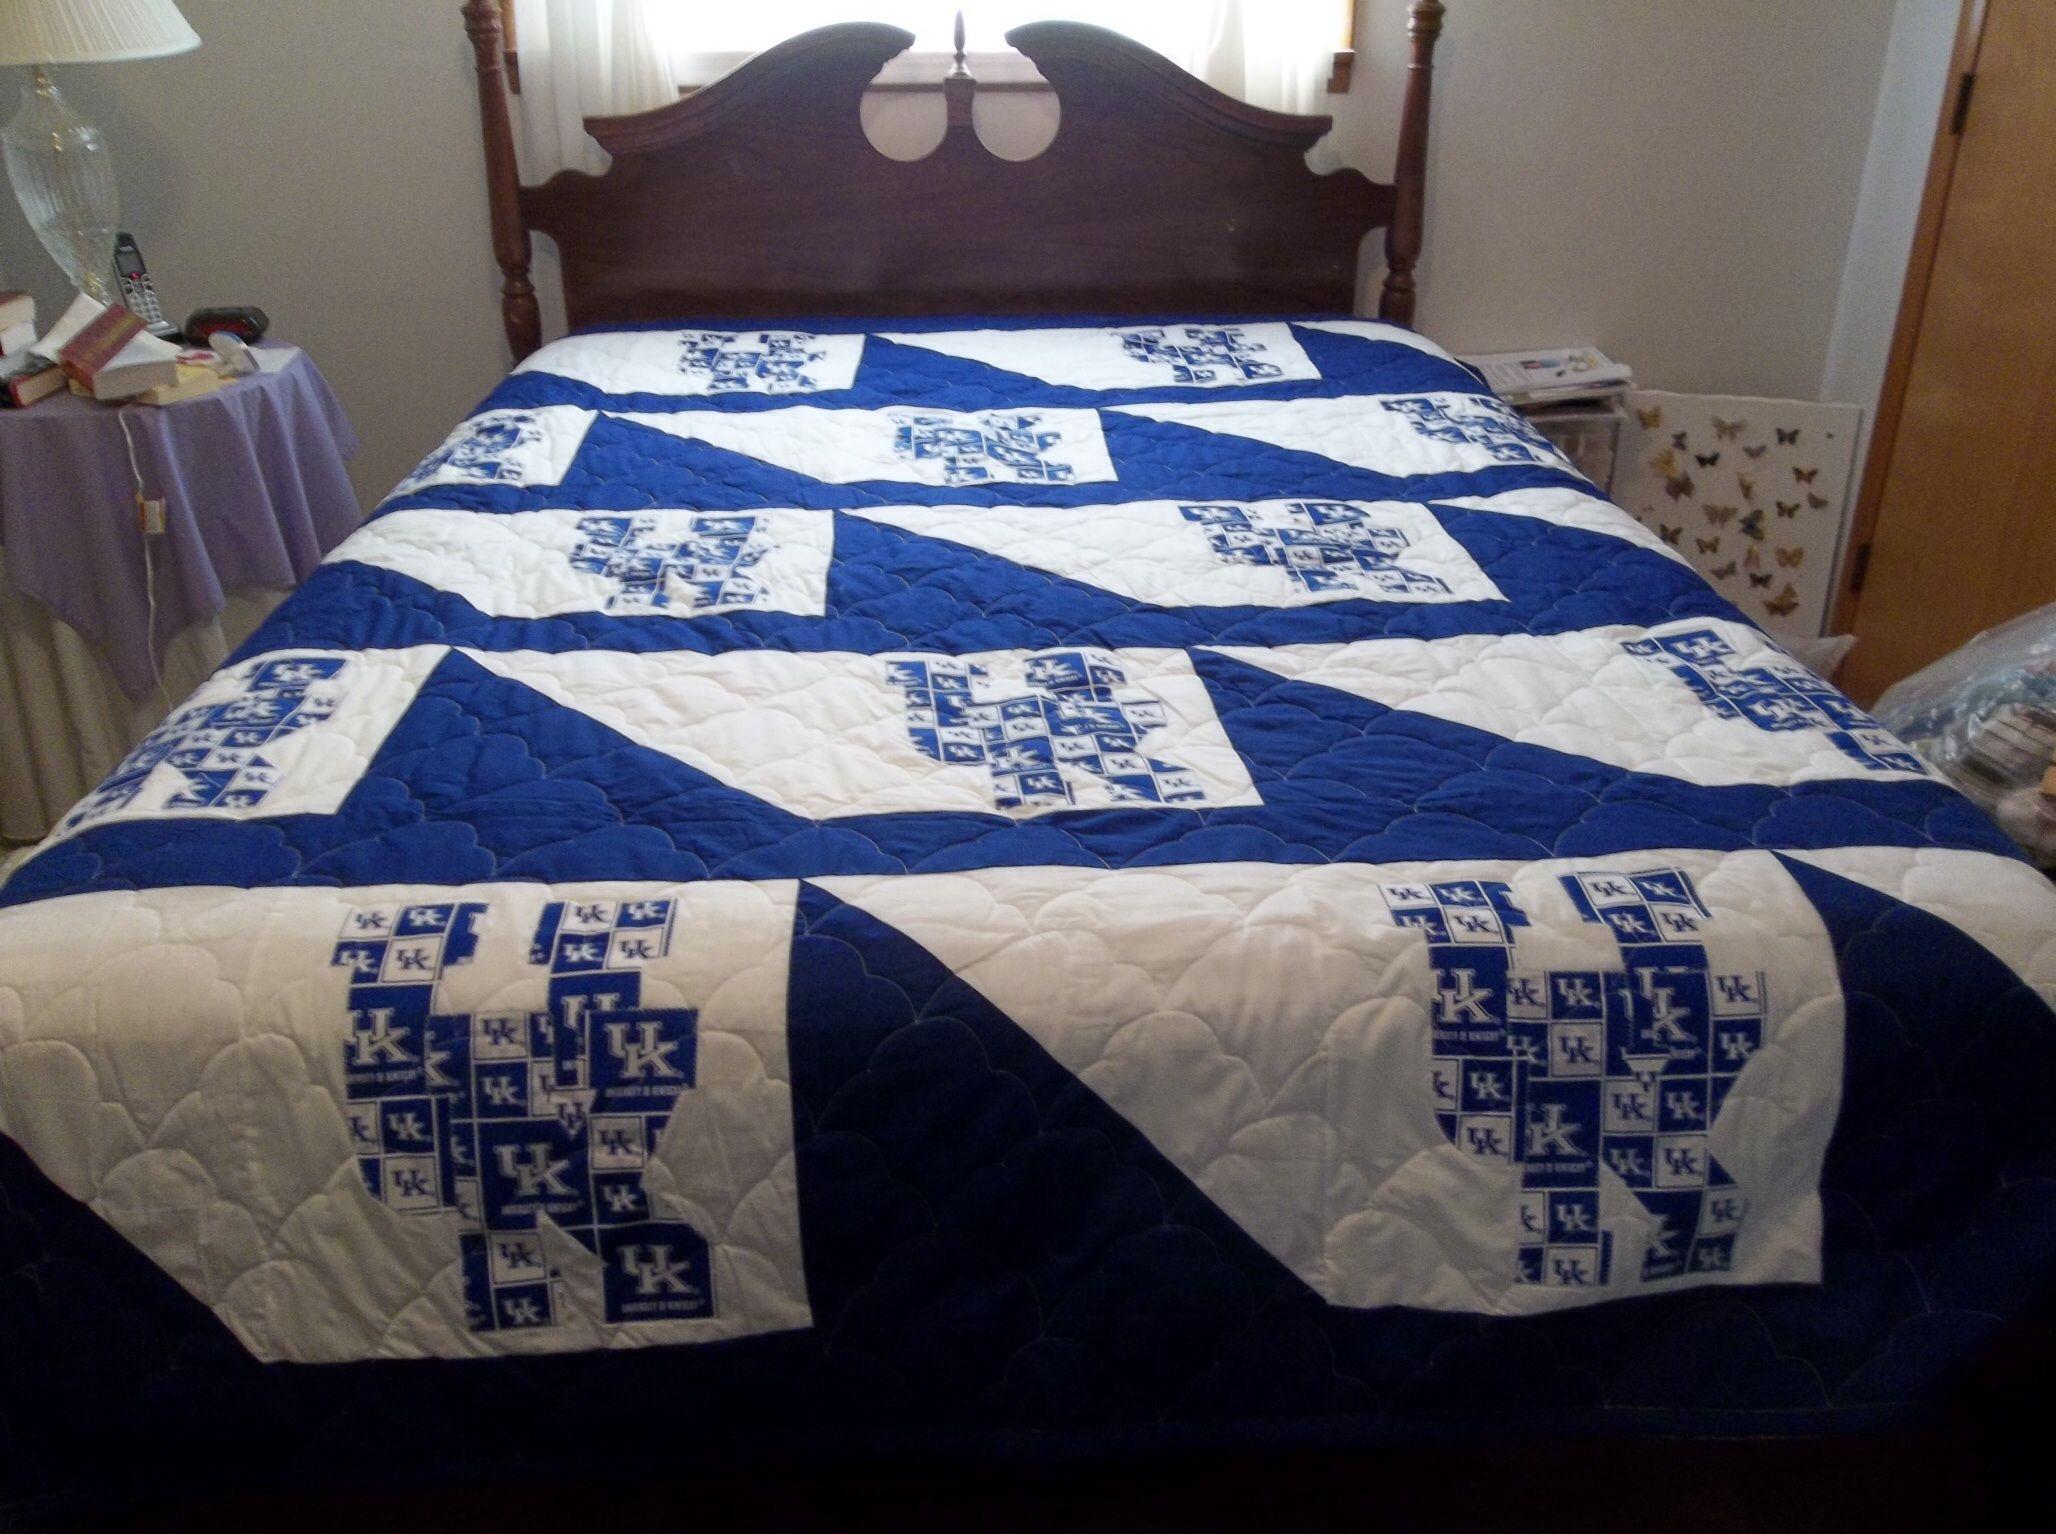 University of Kentucky Quilt @sarahmvain @barbrease | crafts ... : university of kentucky quilt - Adamdwight.com